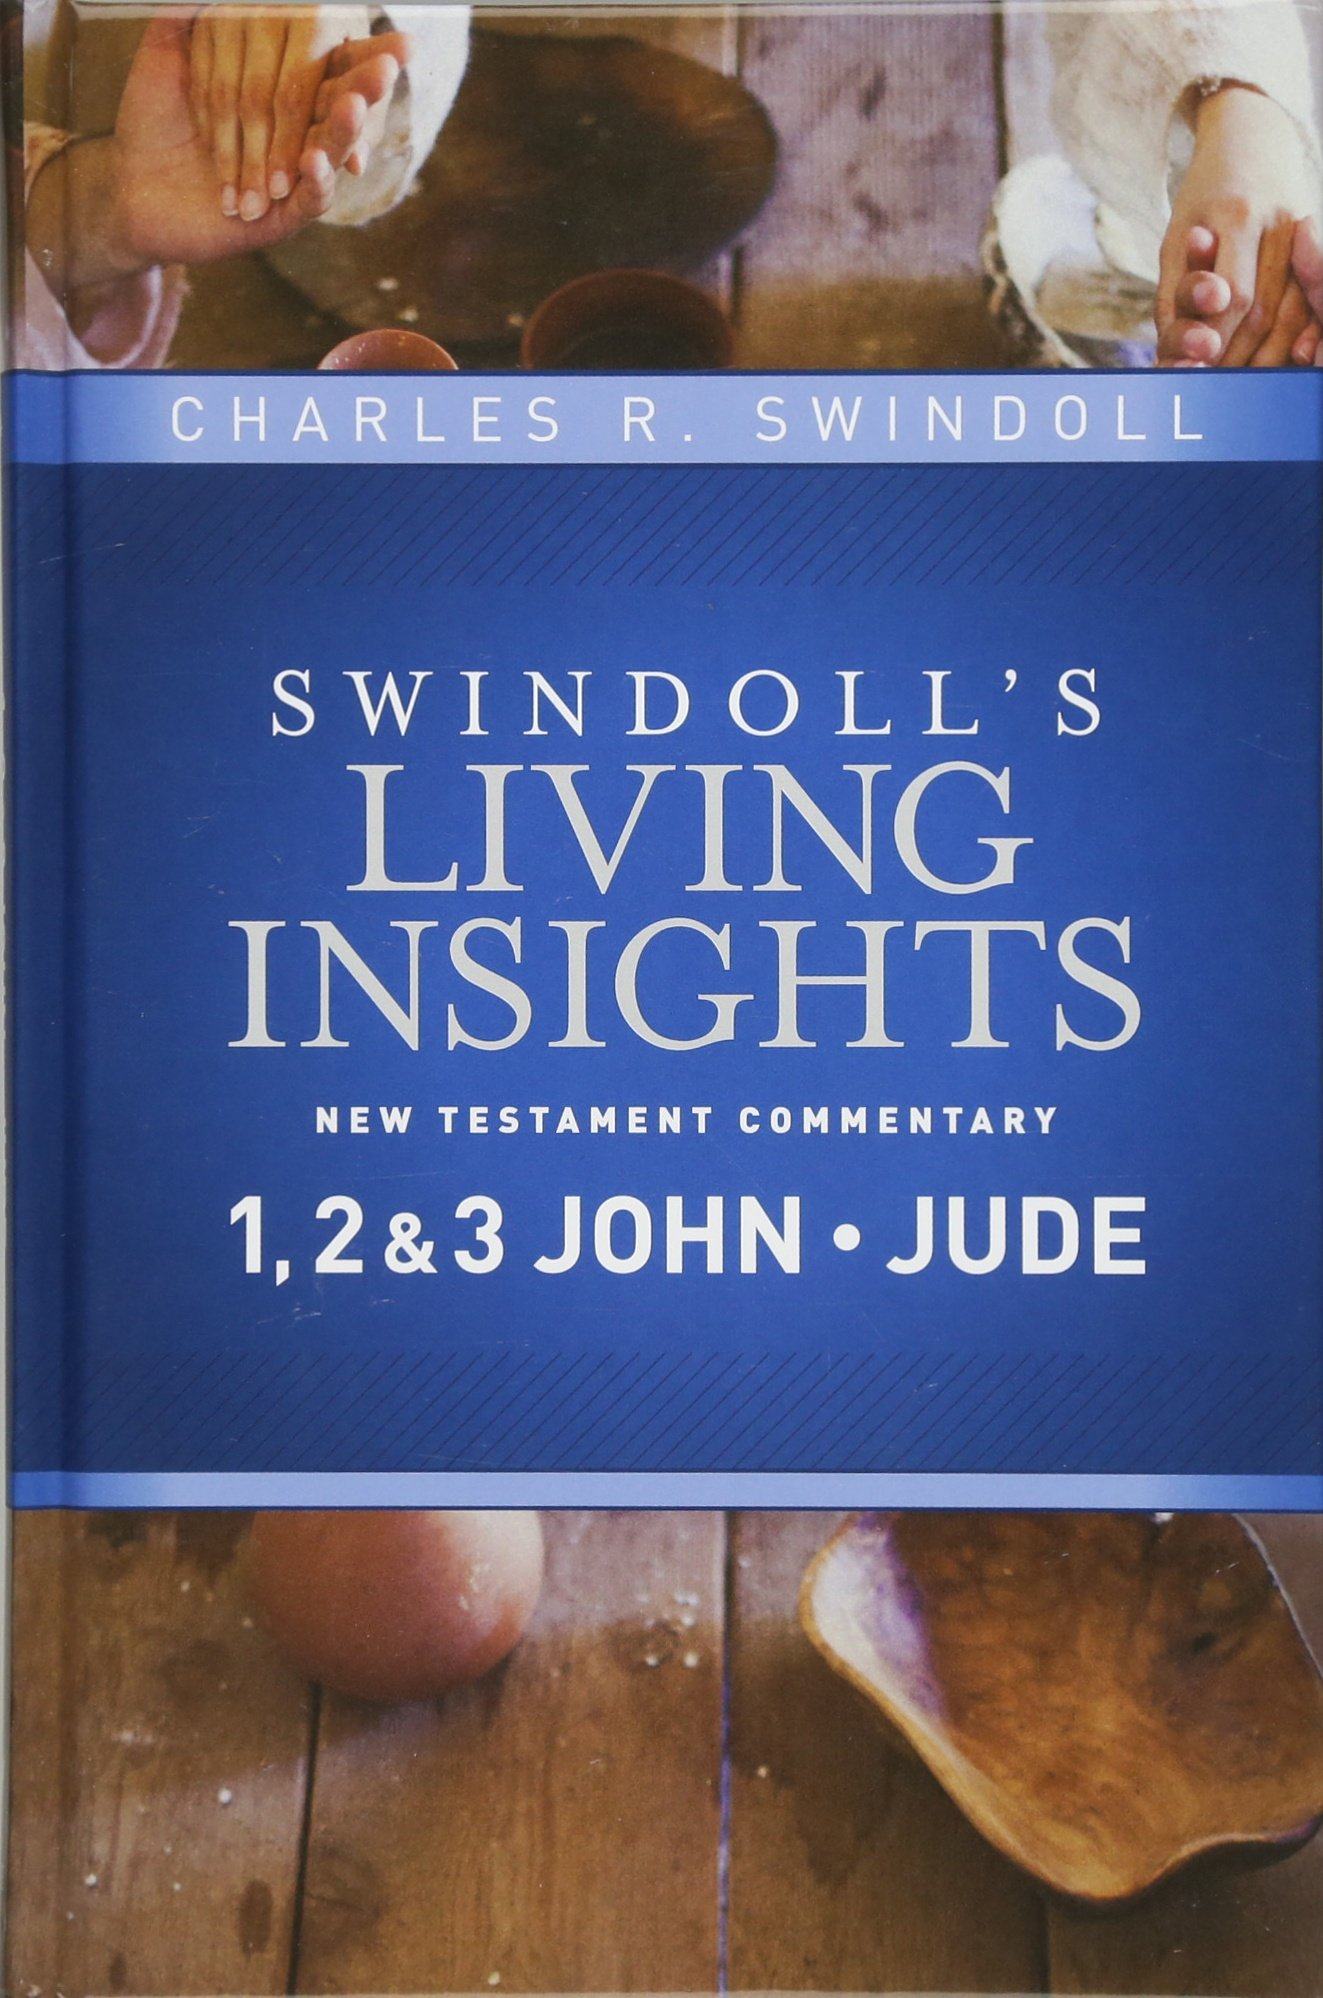 Insights On 1 2 3 John Jude Swindoll S Living Insights New Testament Commentary Swindoll Charles R 9781414393742 Amazon Com Books